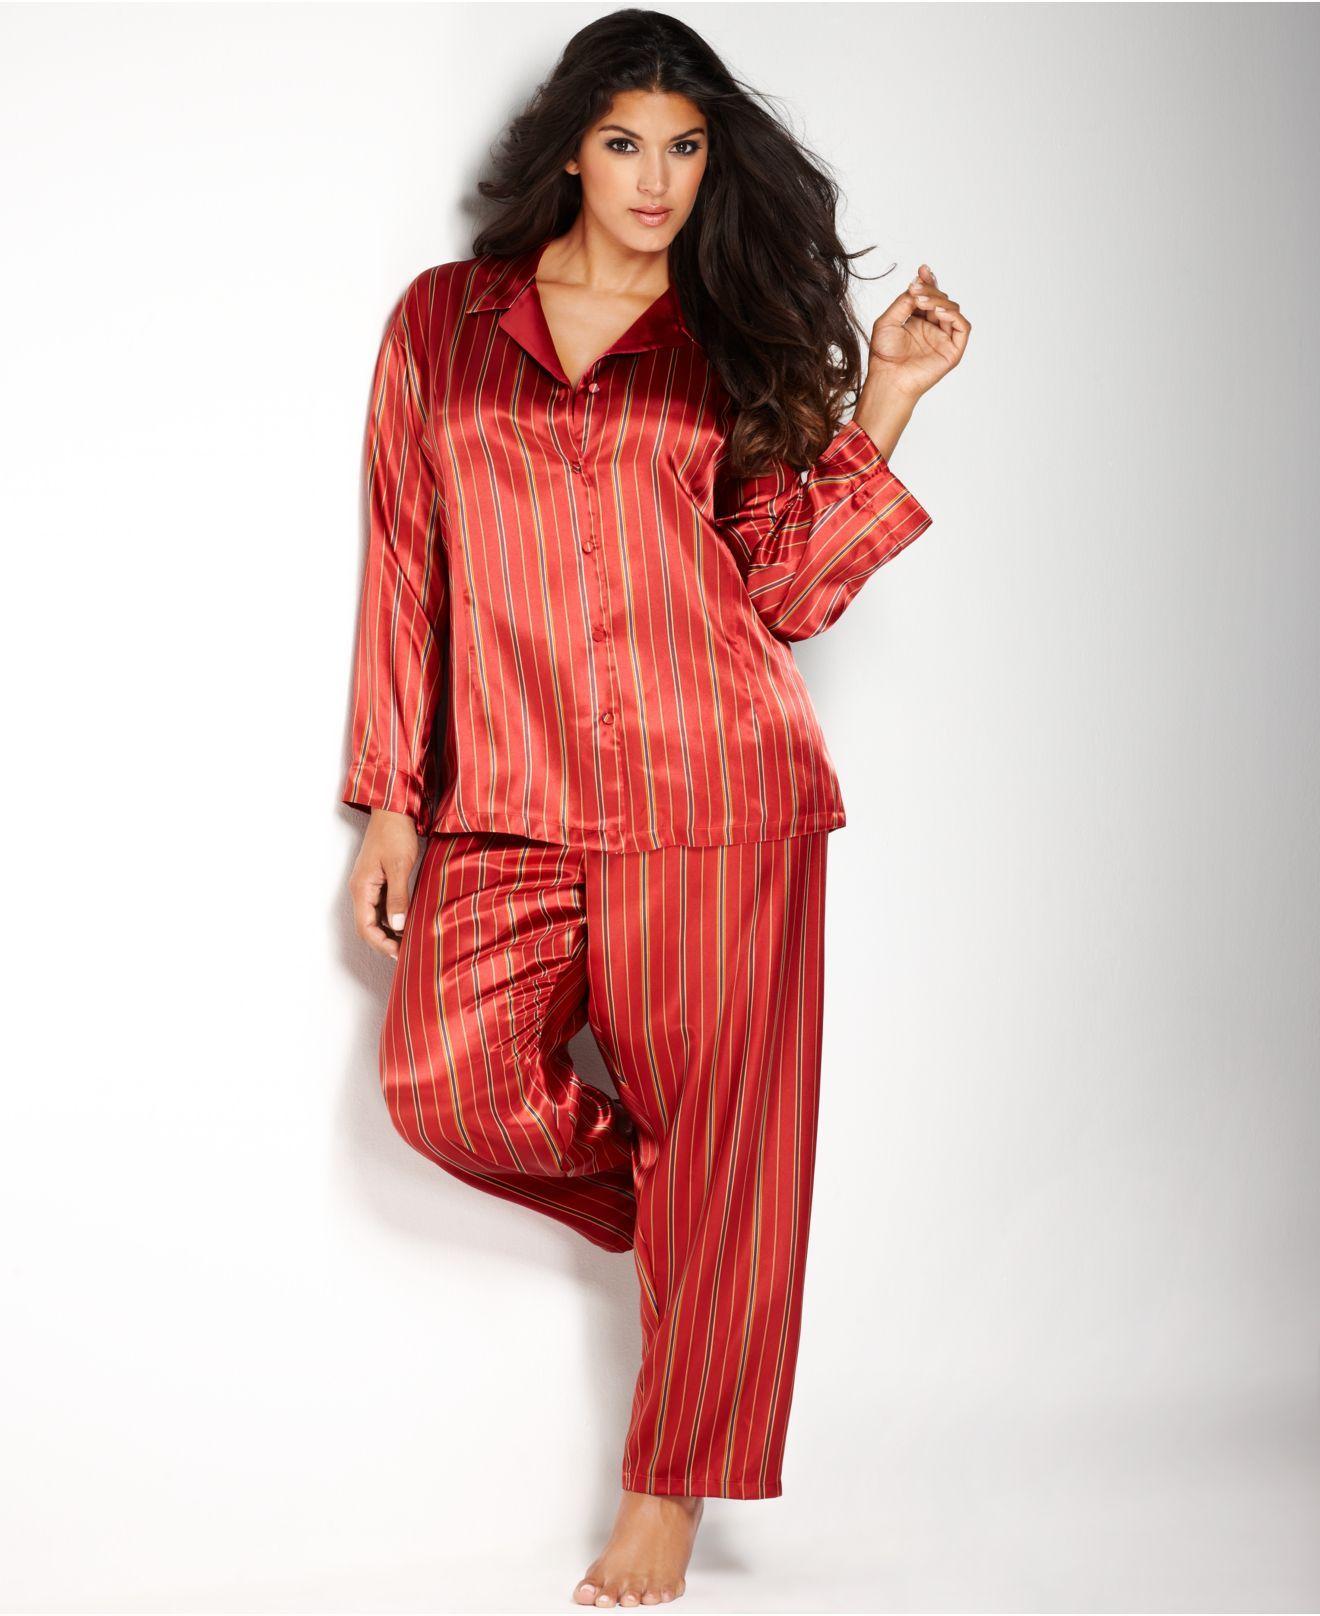 df201efa2edb0 Red Plus Size Satin Pajama Set